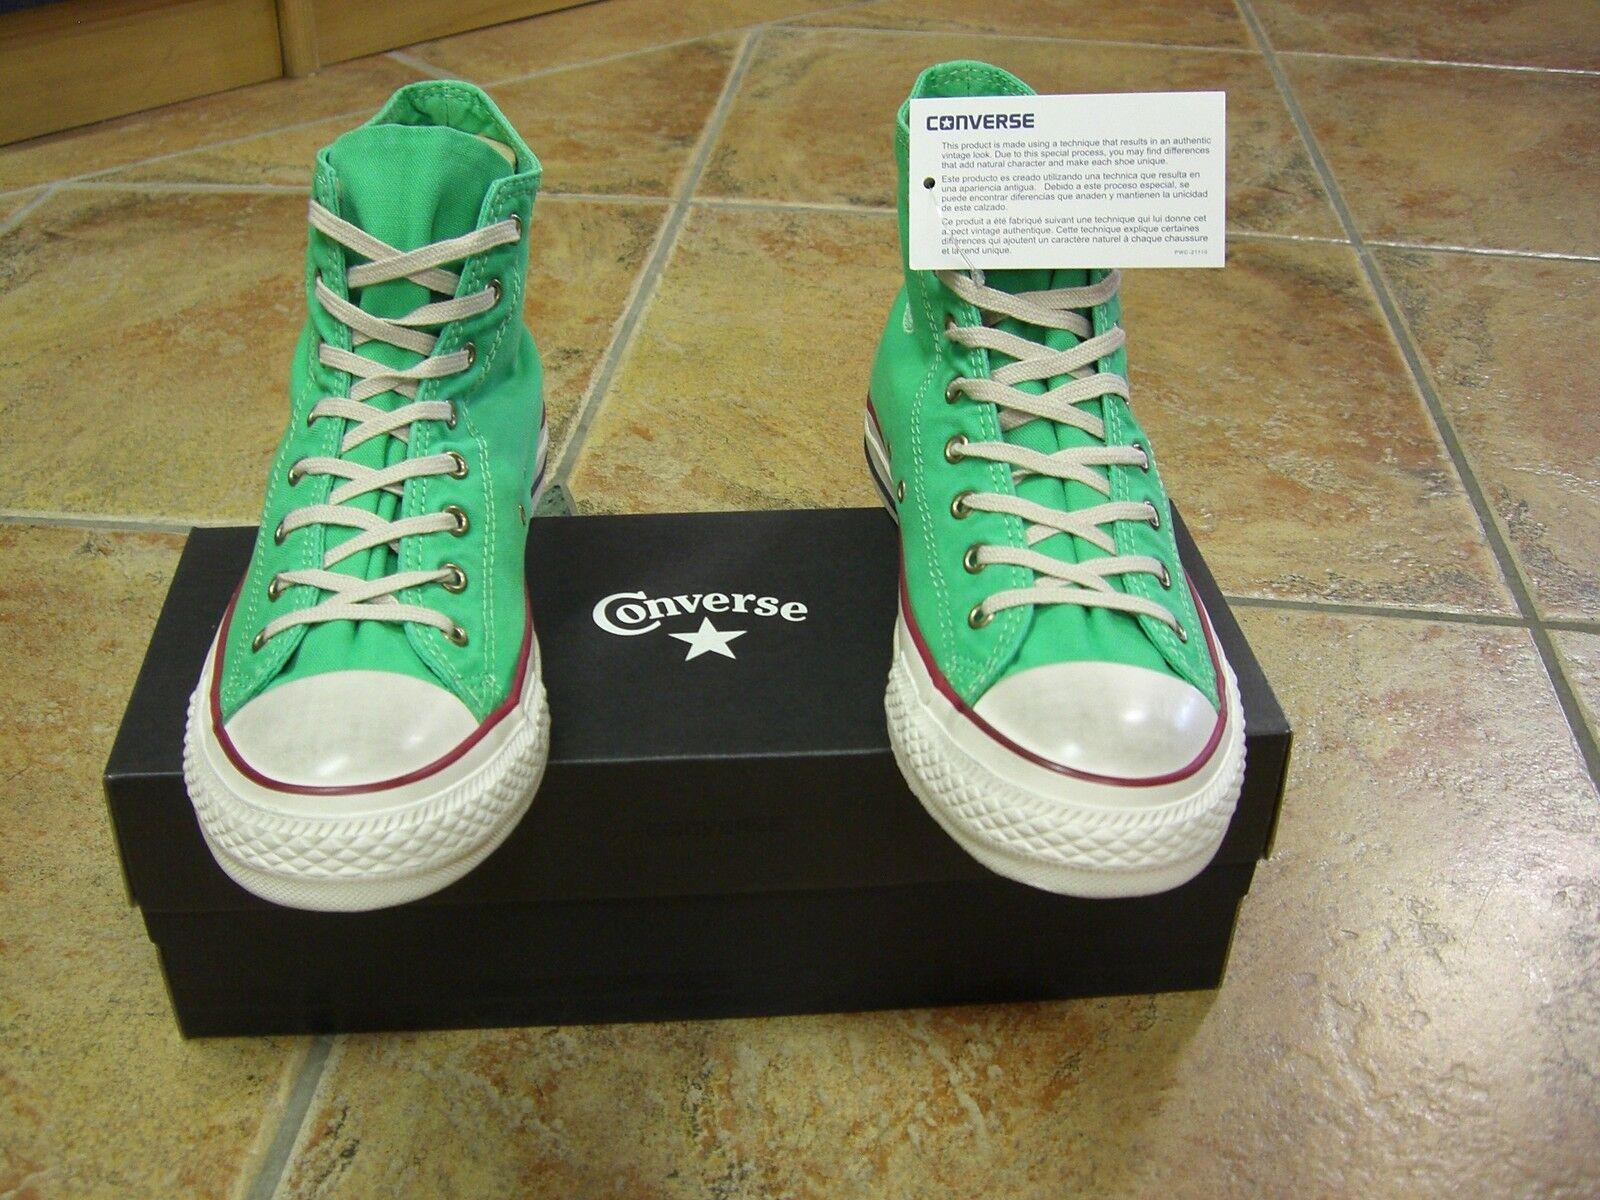 Converse Chucks All Star Gr. 36 HI DEEP MINT 136888C  NEU Top aktuell